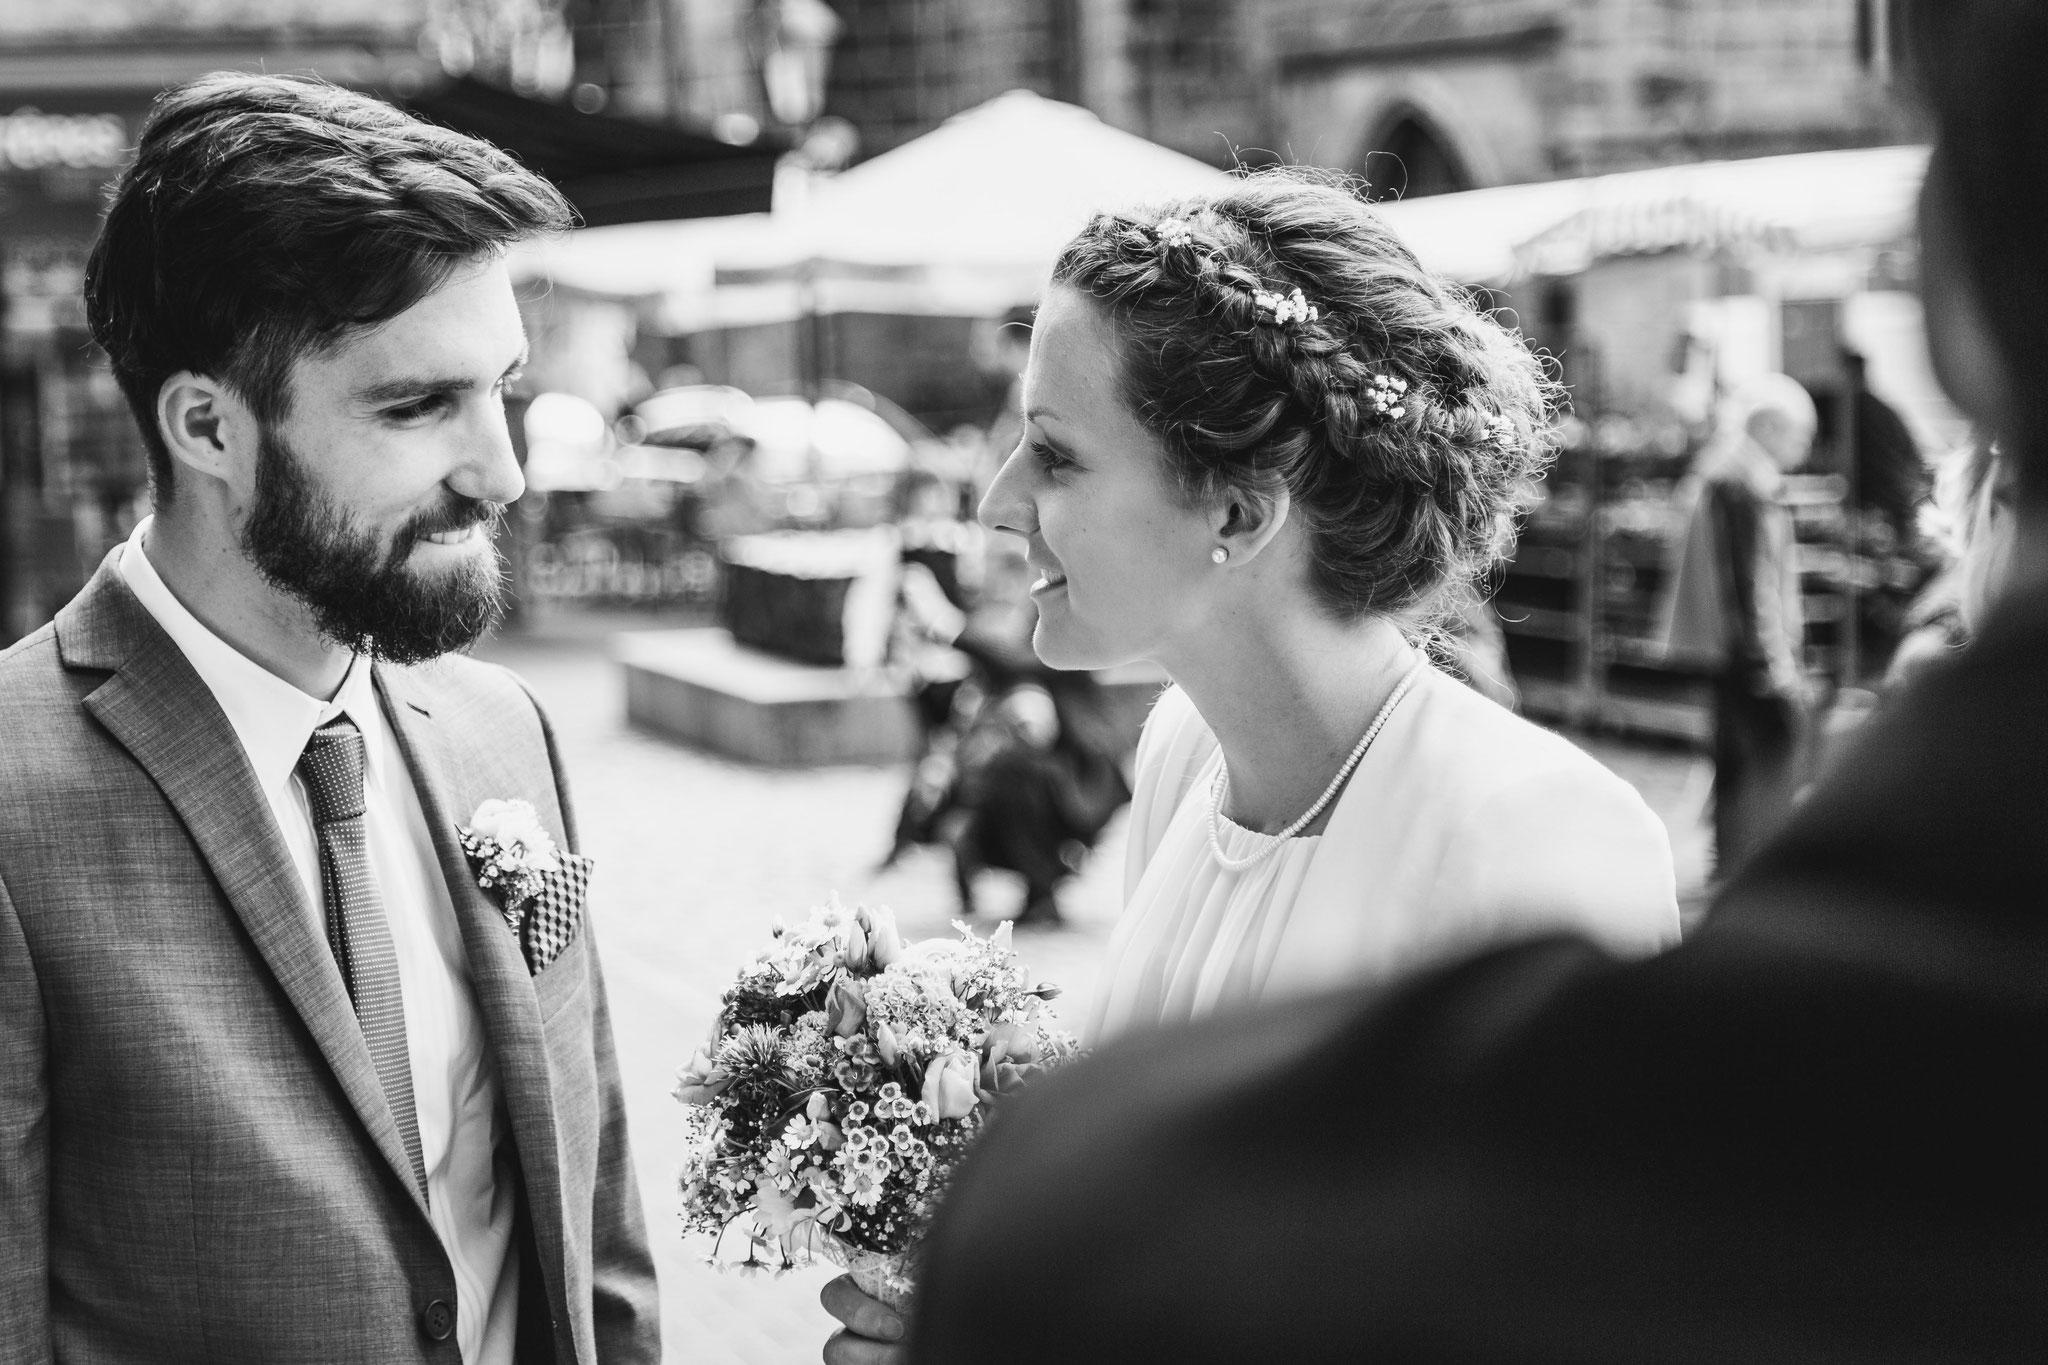 Hochzeitsfotograf in Nürnberg - Standesamt Nürnberg Fotografie Riedelmeier